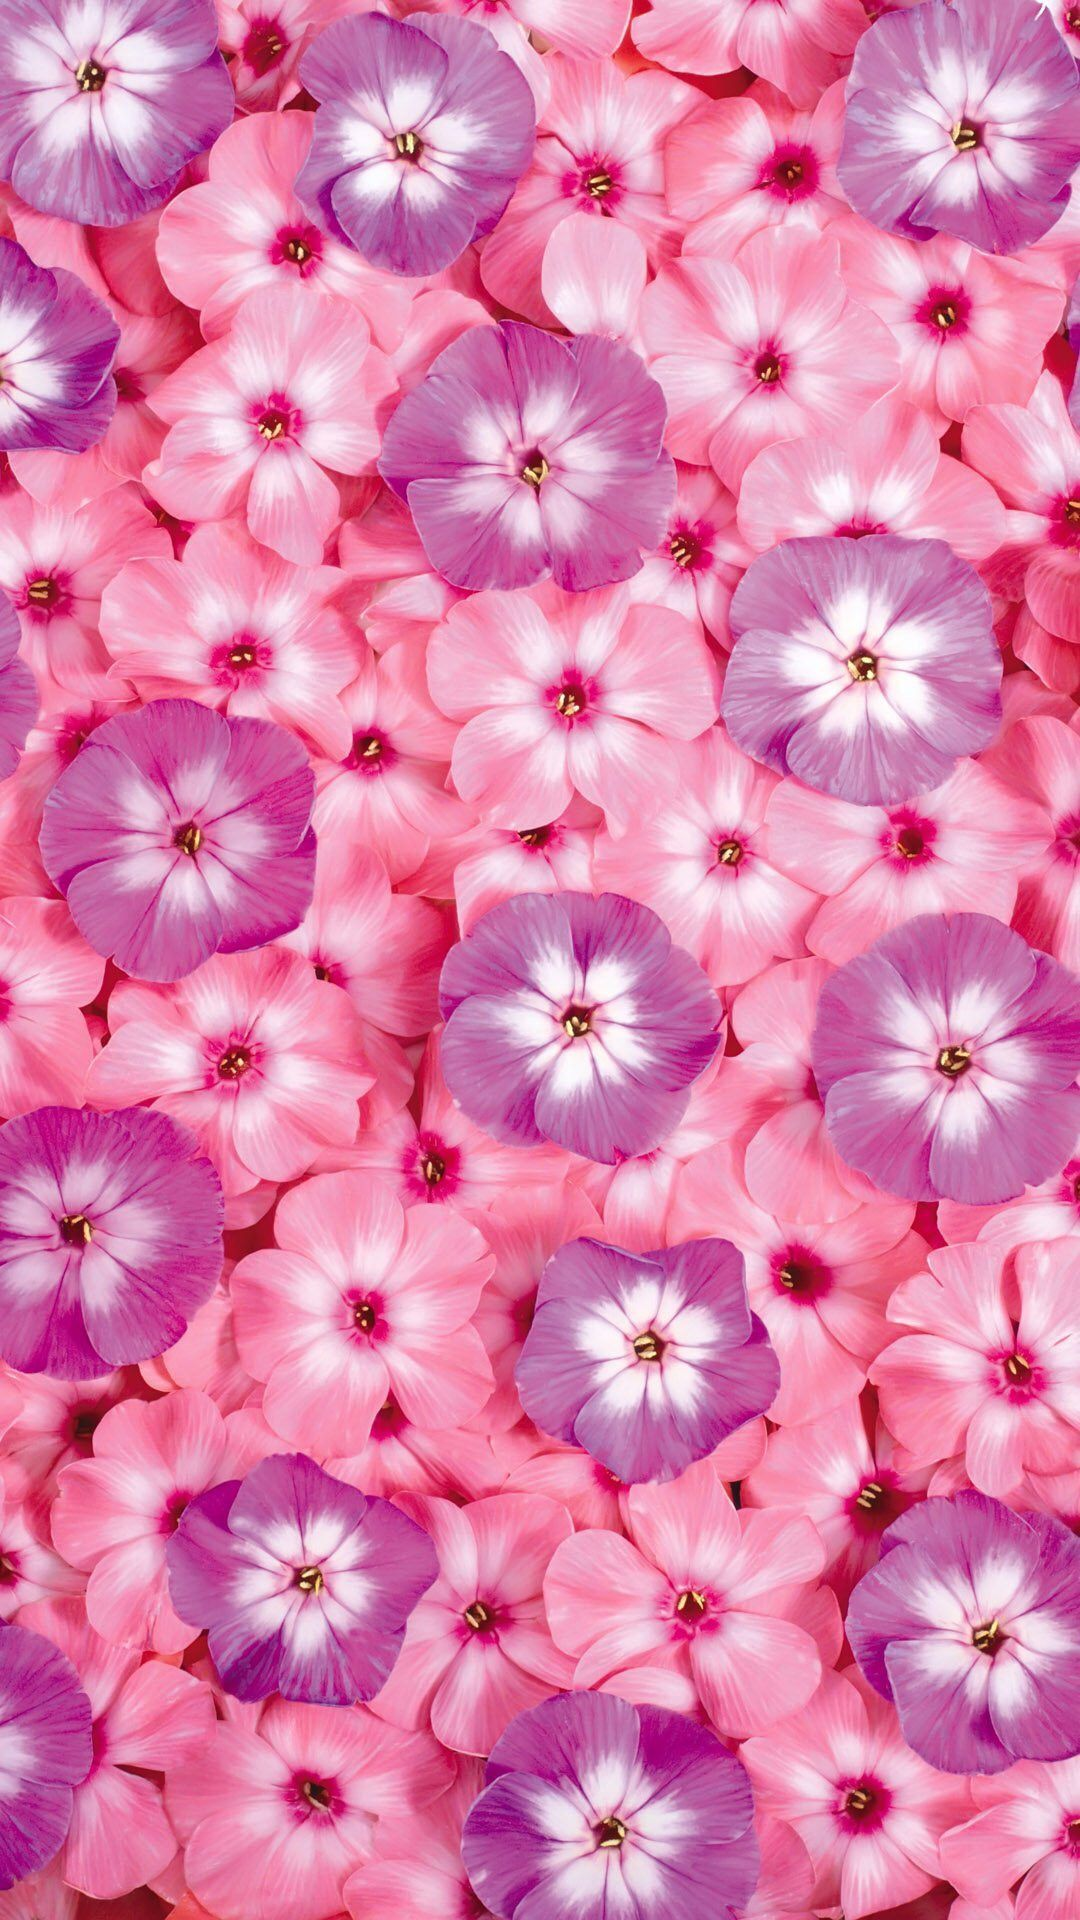 Pink Petal Flower Lilac Purple Plant Flower Iphone Wallpaper Flower Phone Wallpaper Flower Wallpaper